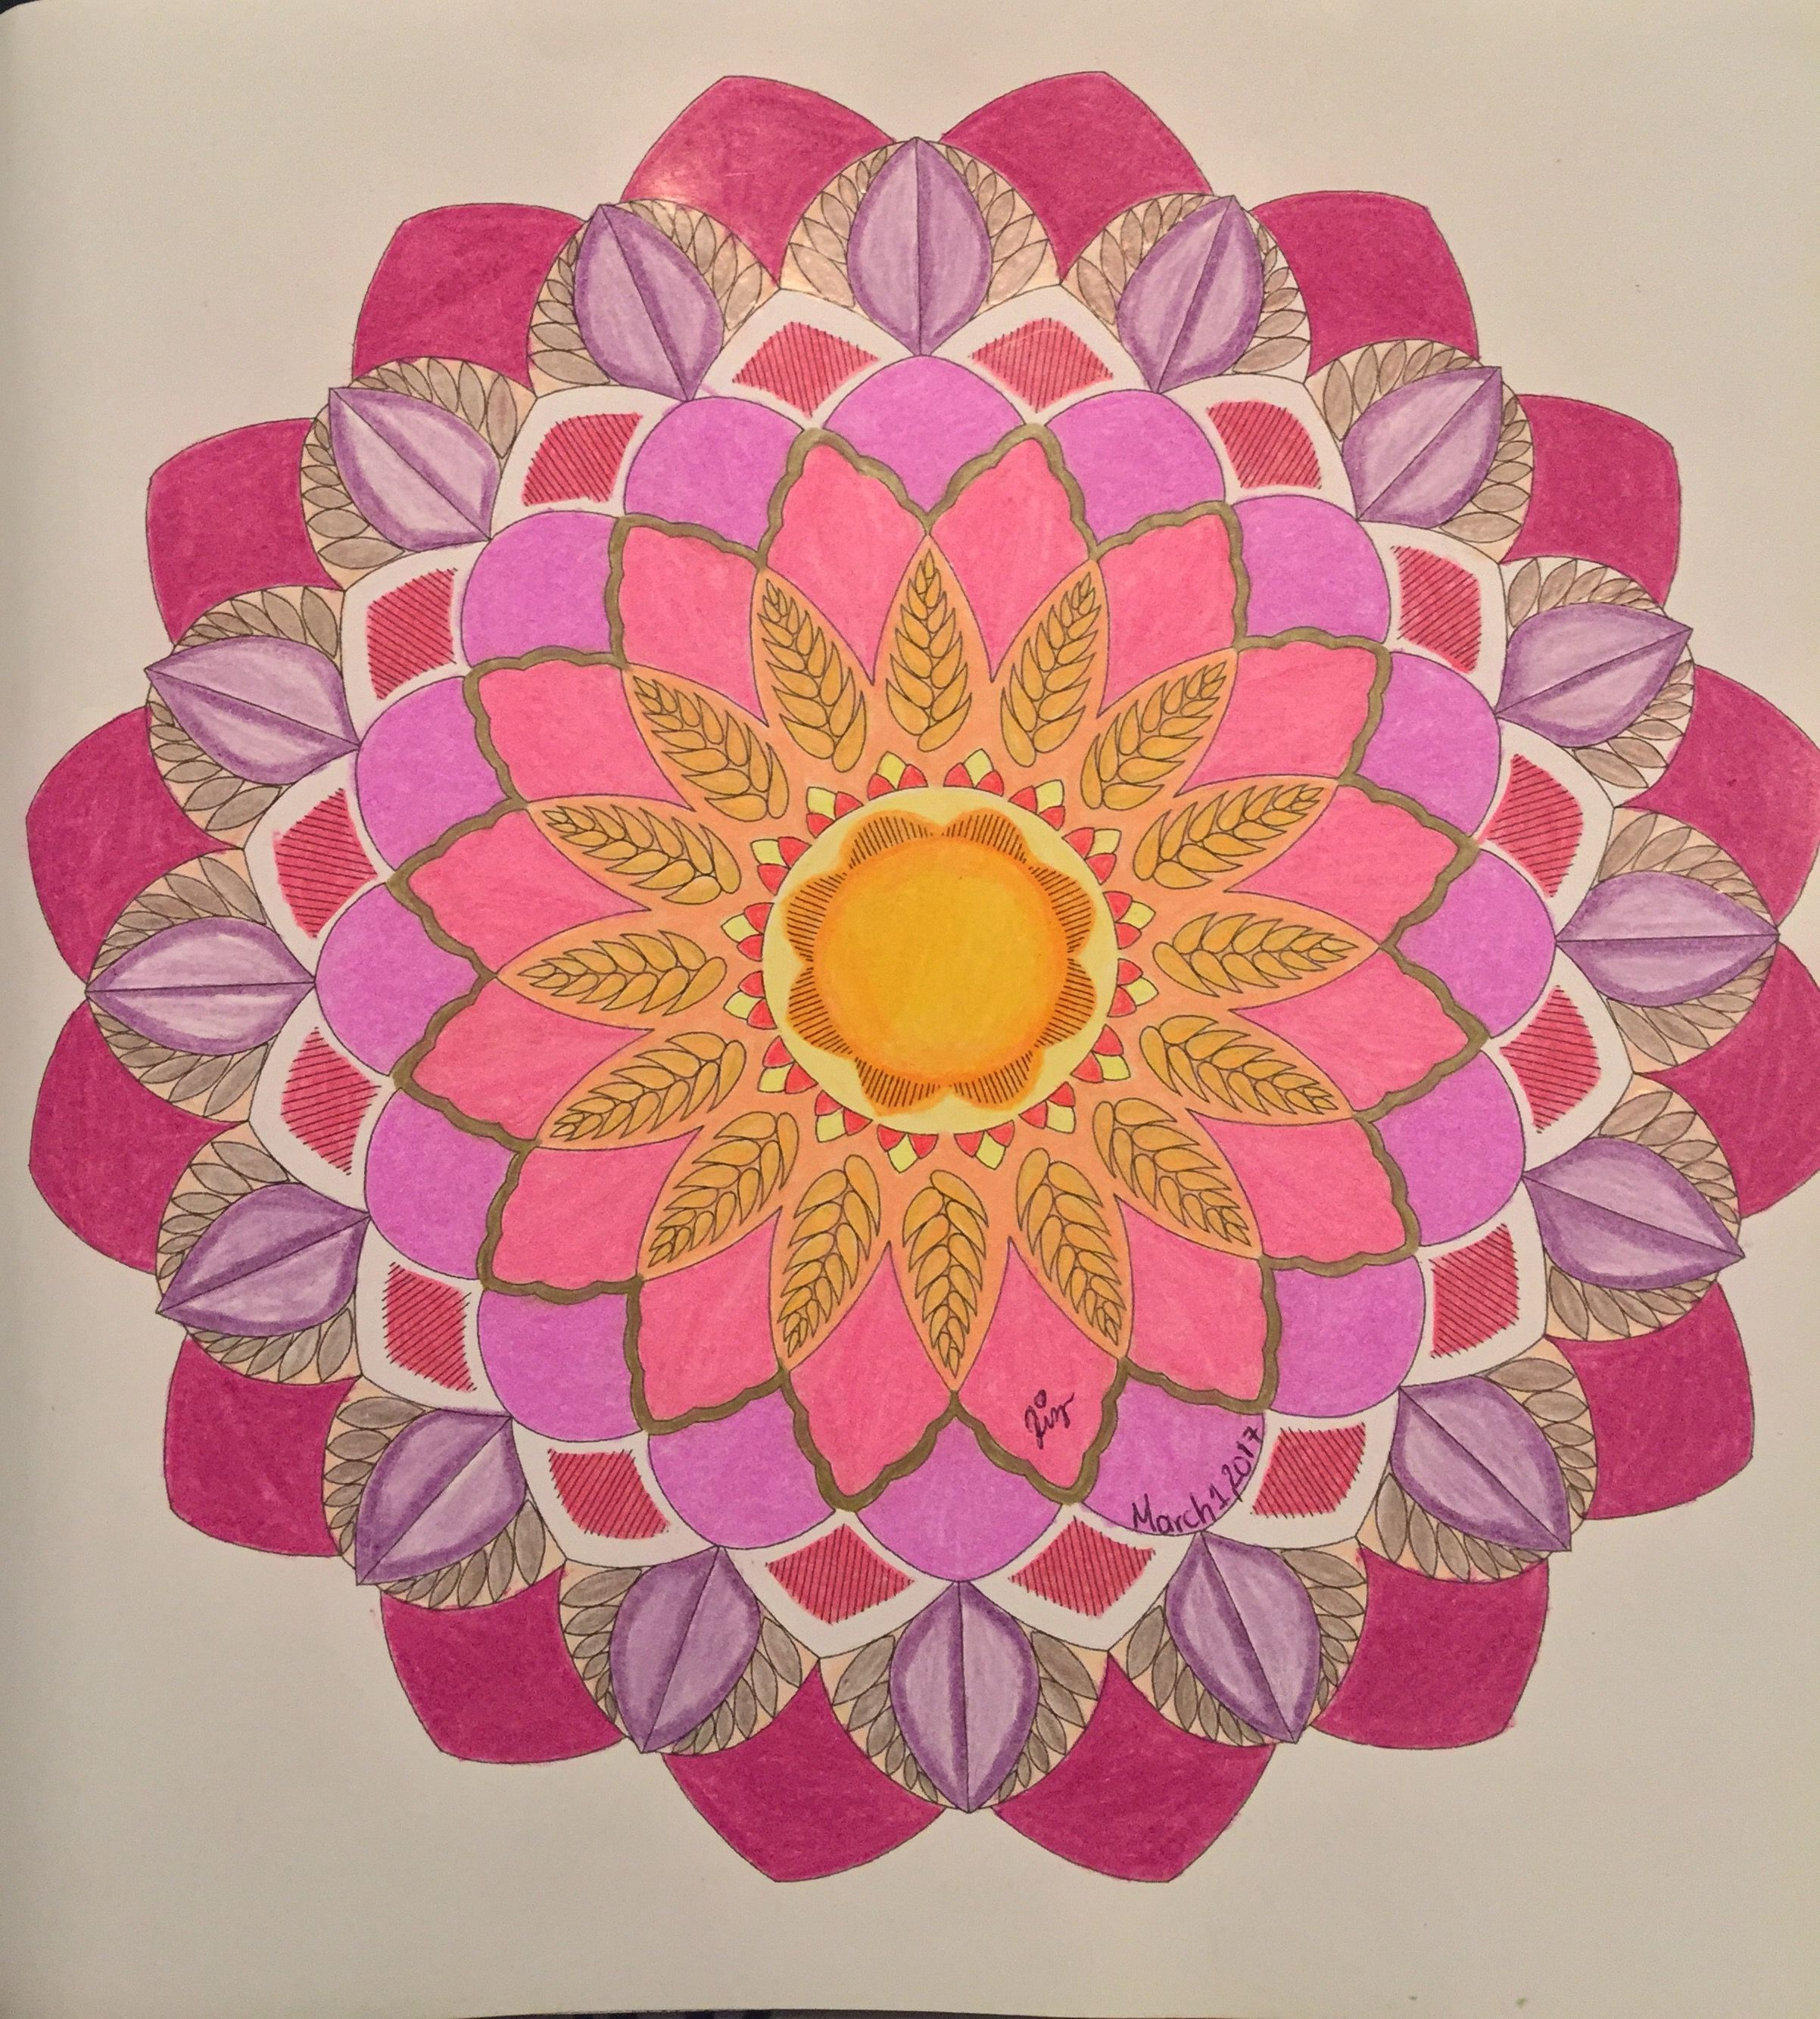 Animal Kingdom Millie Marotta Colouring Book Adult Colouring